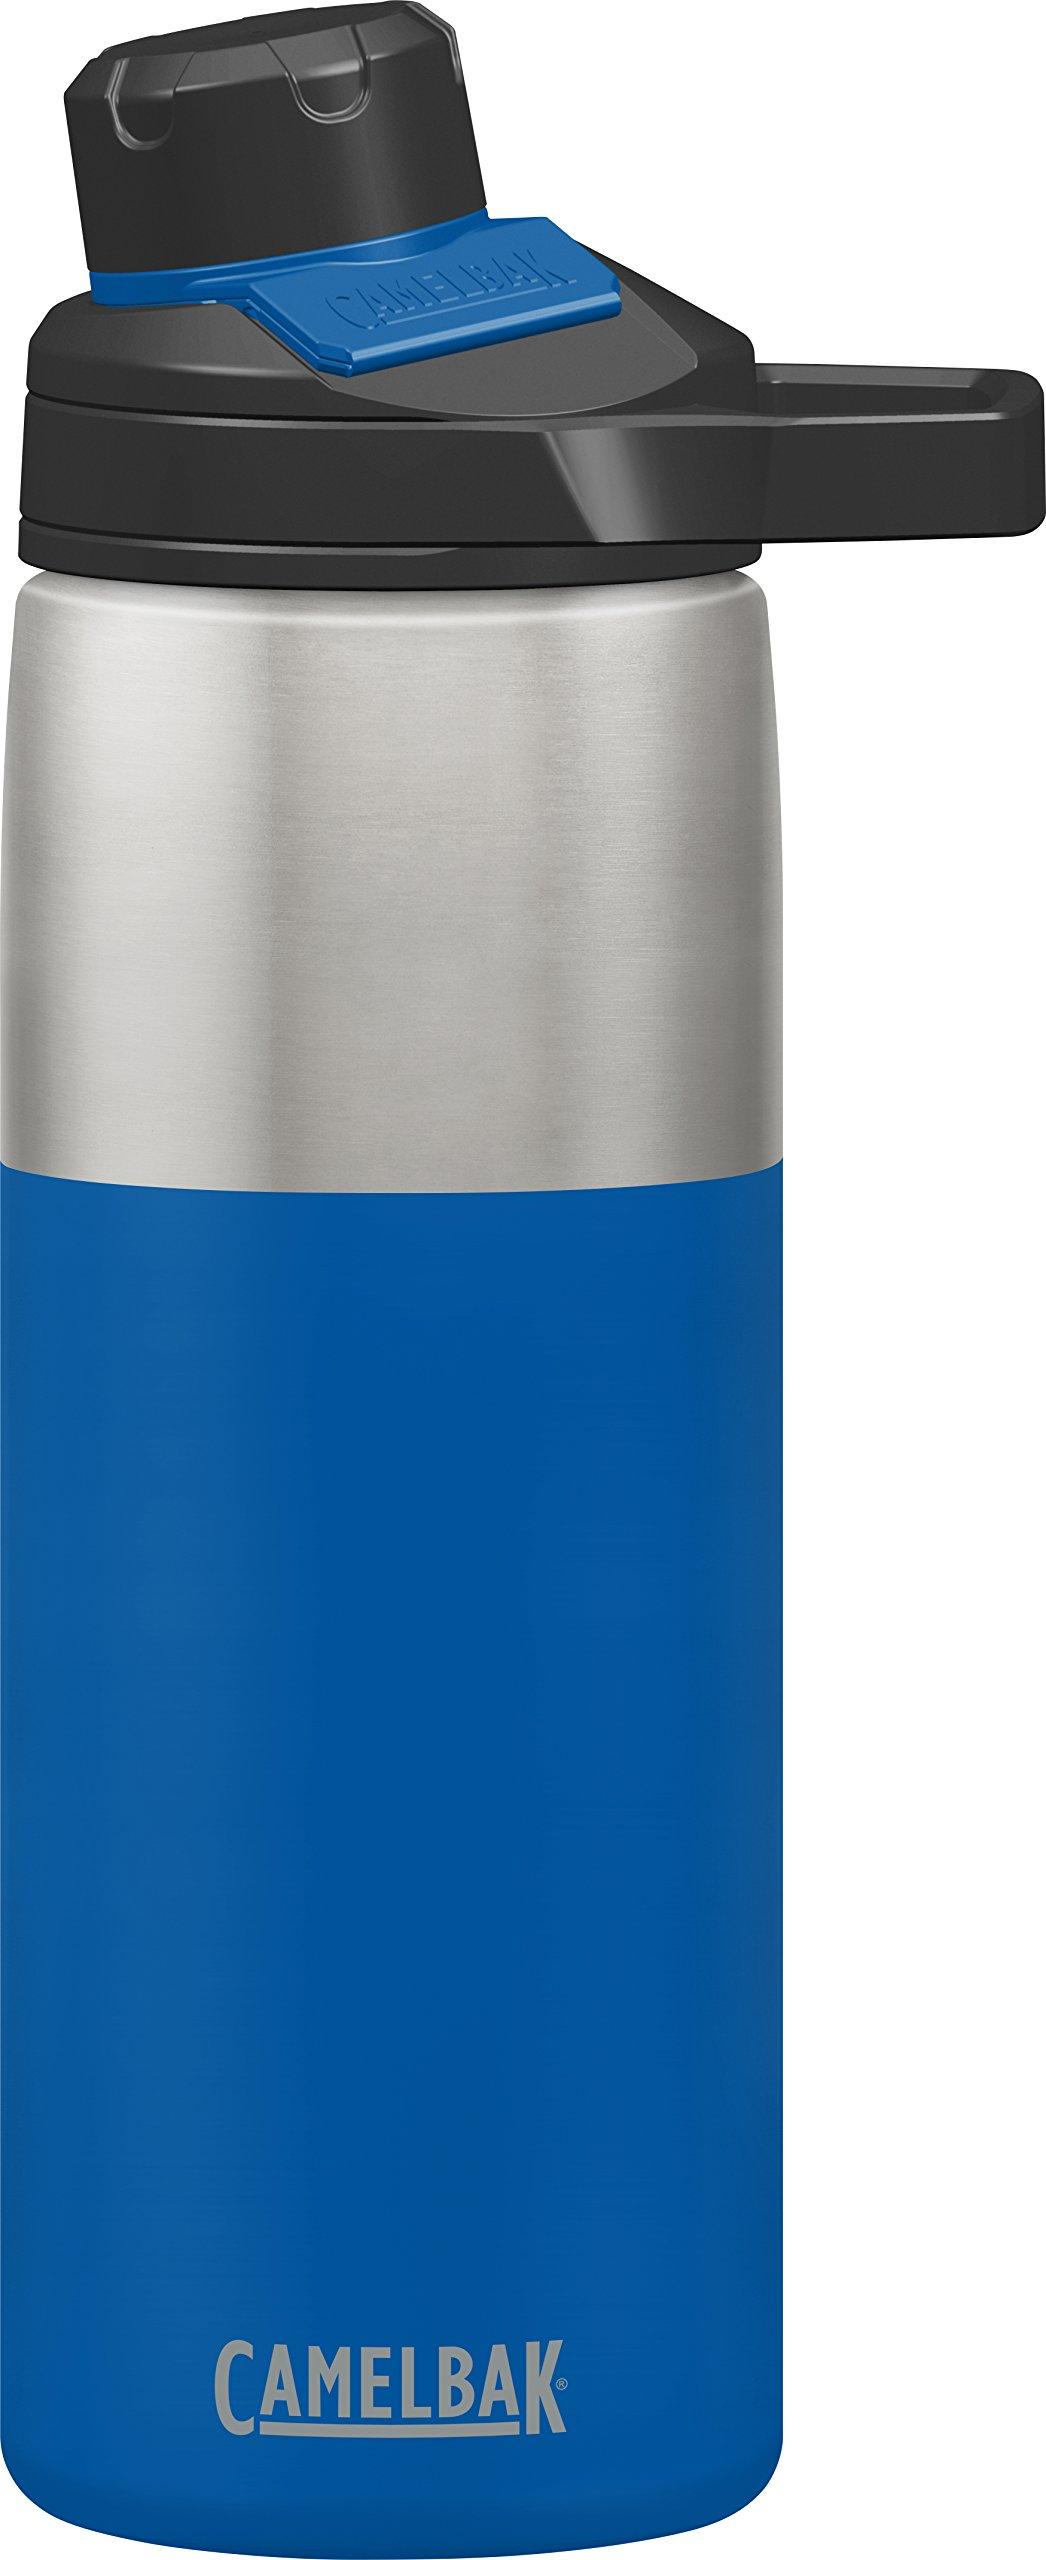 CamelBak Chute Mag Vacuum Insulated 20oz Cobalt